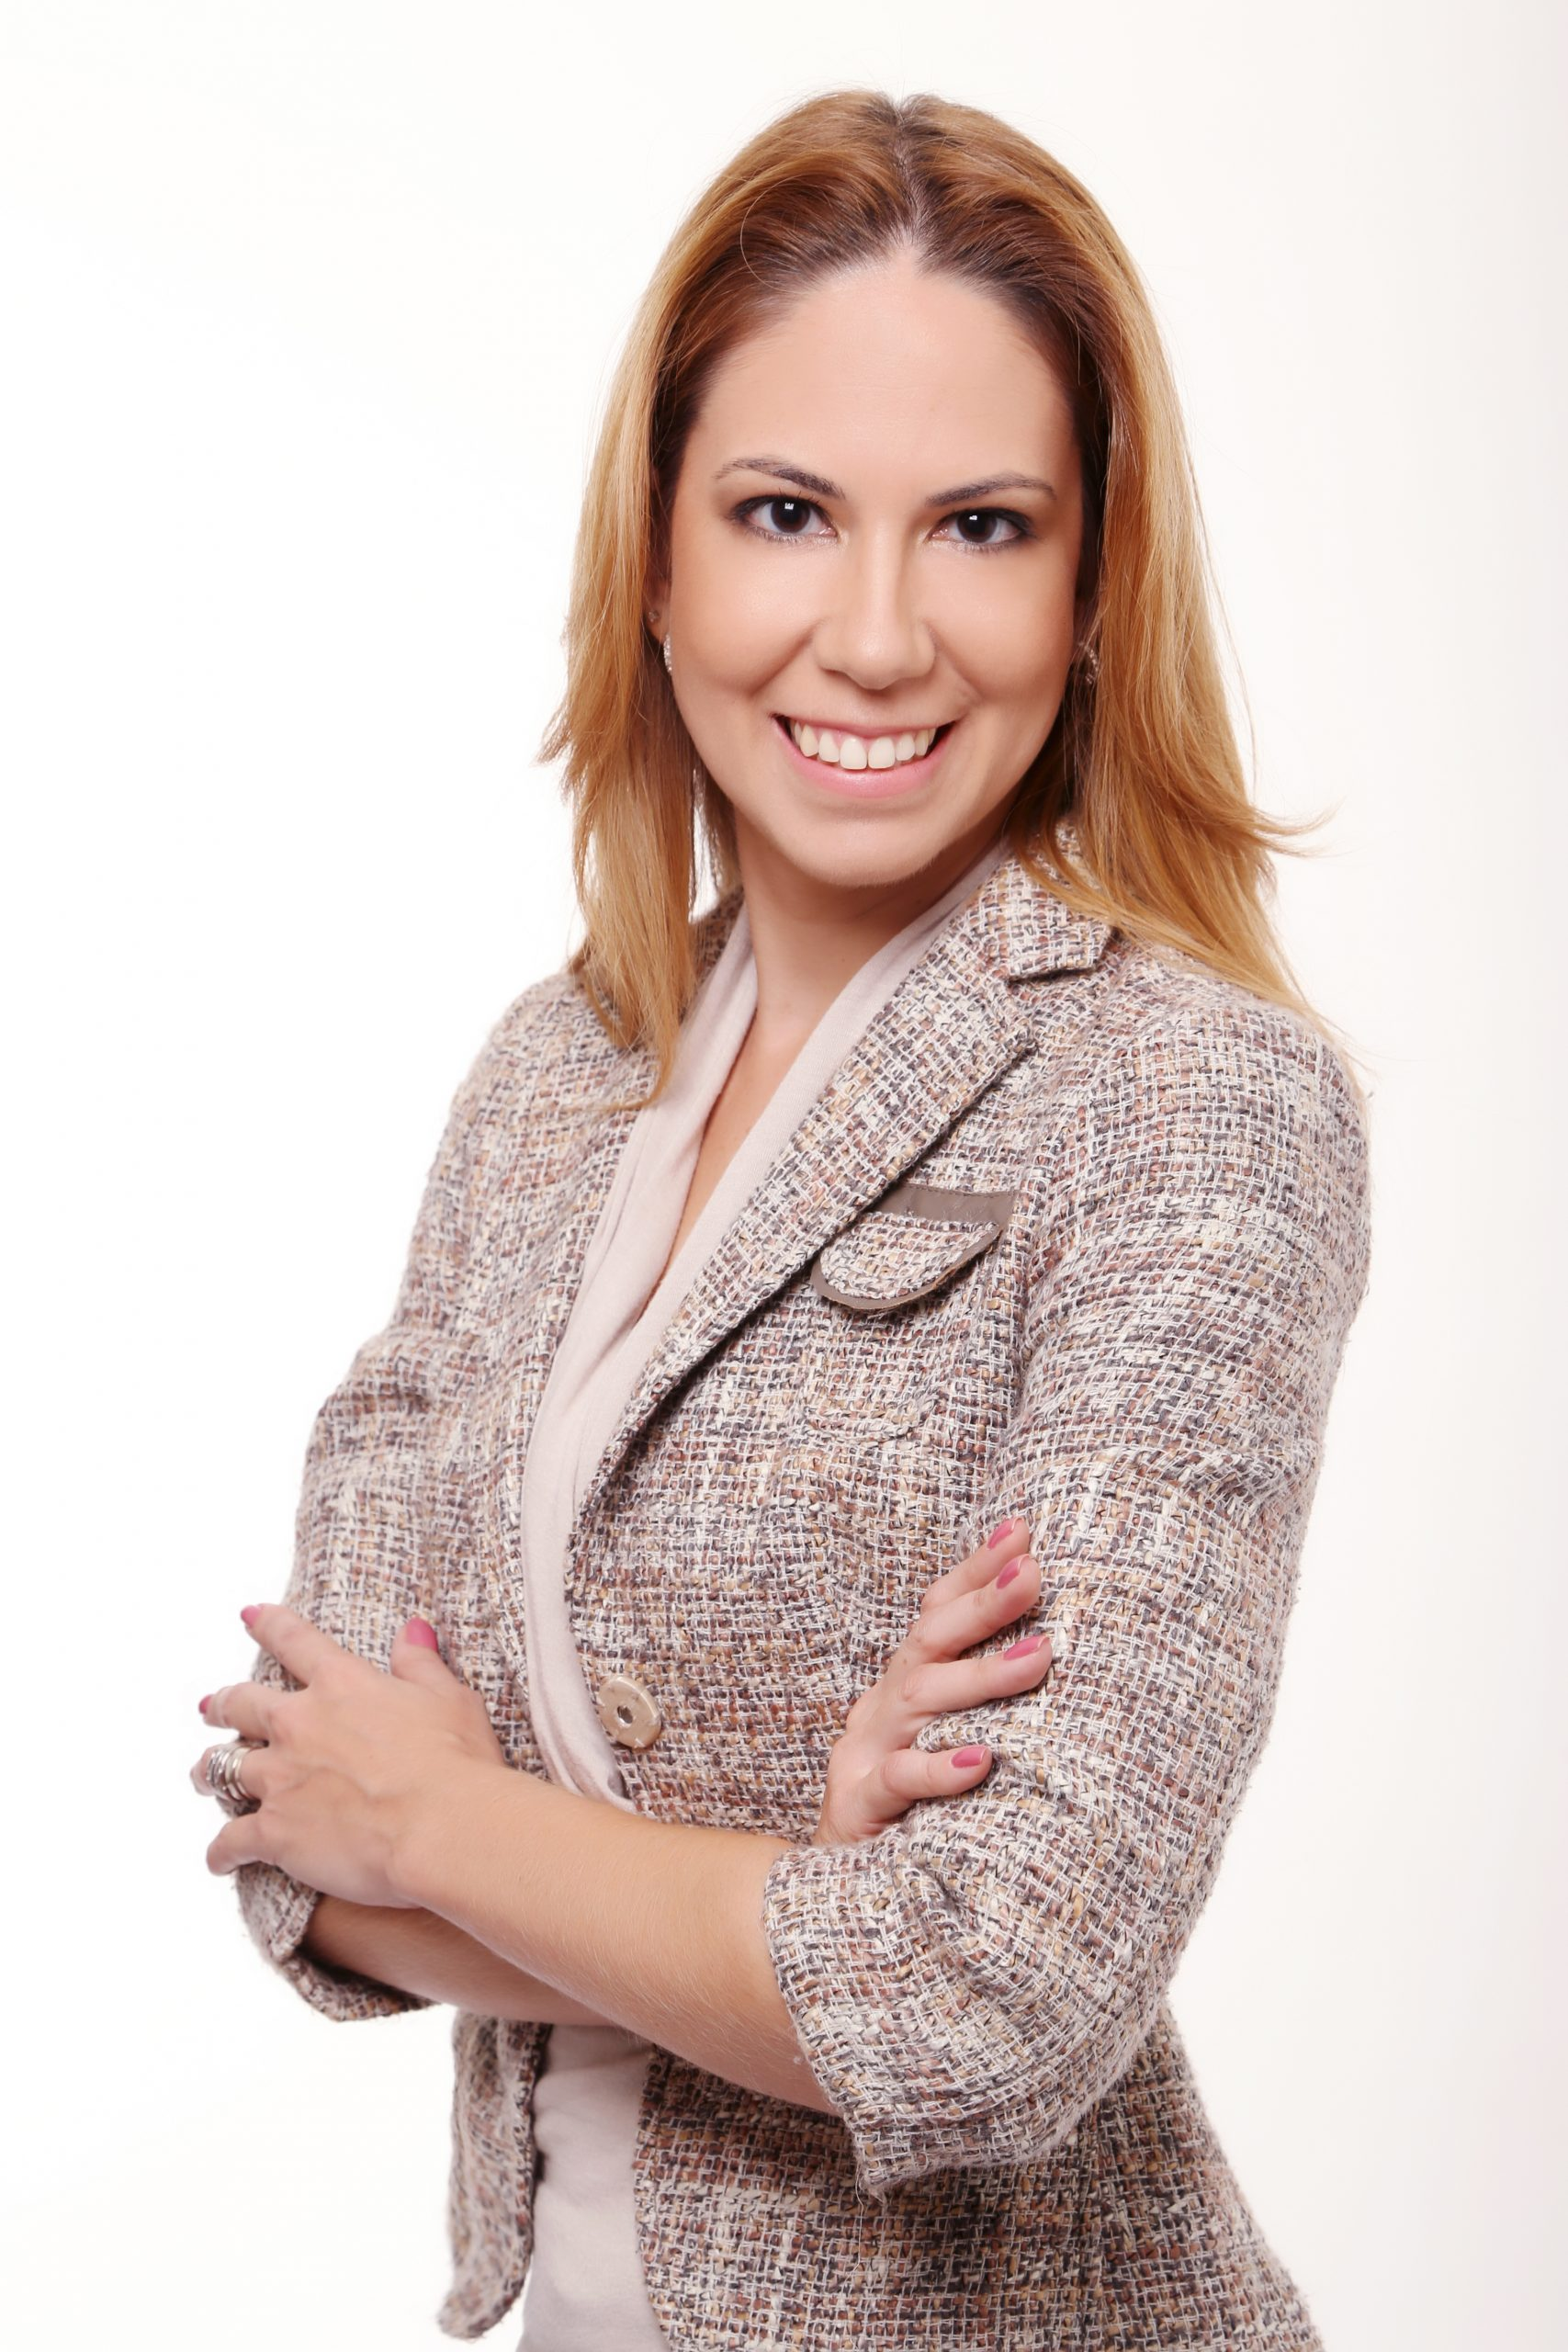 Viviane de Castro Pecanha, Ph.D.